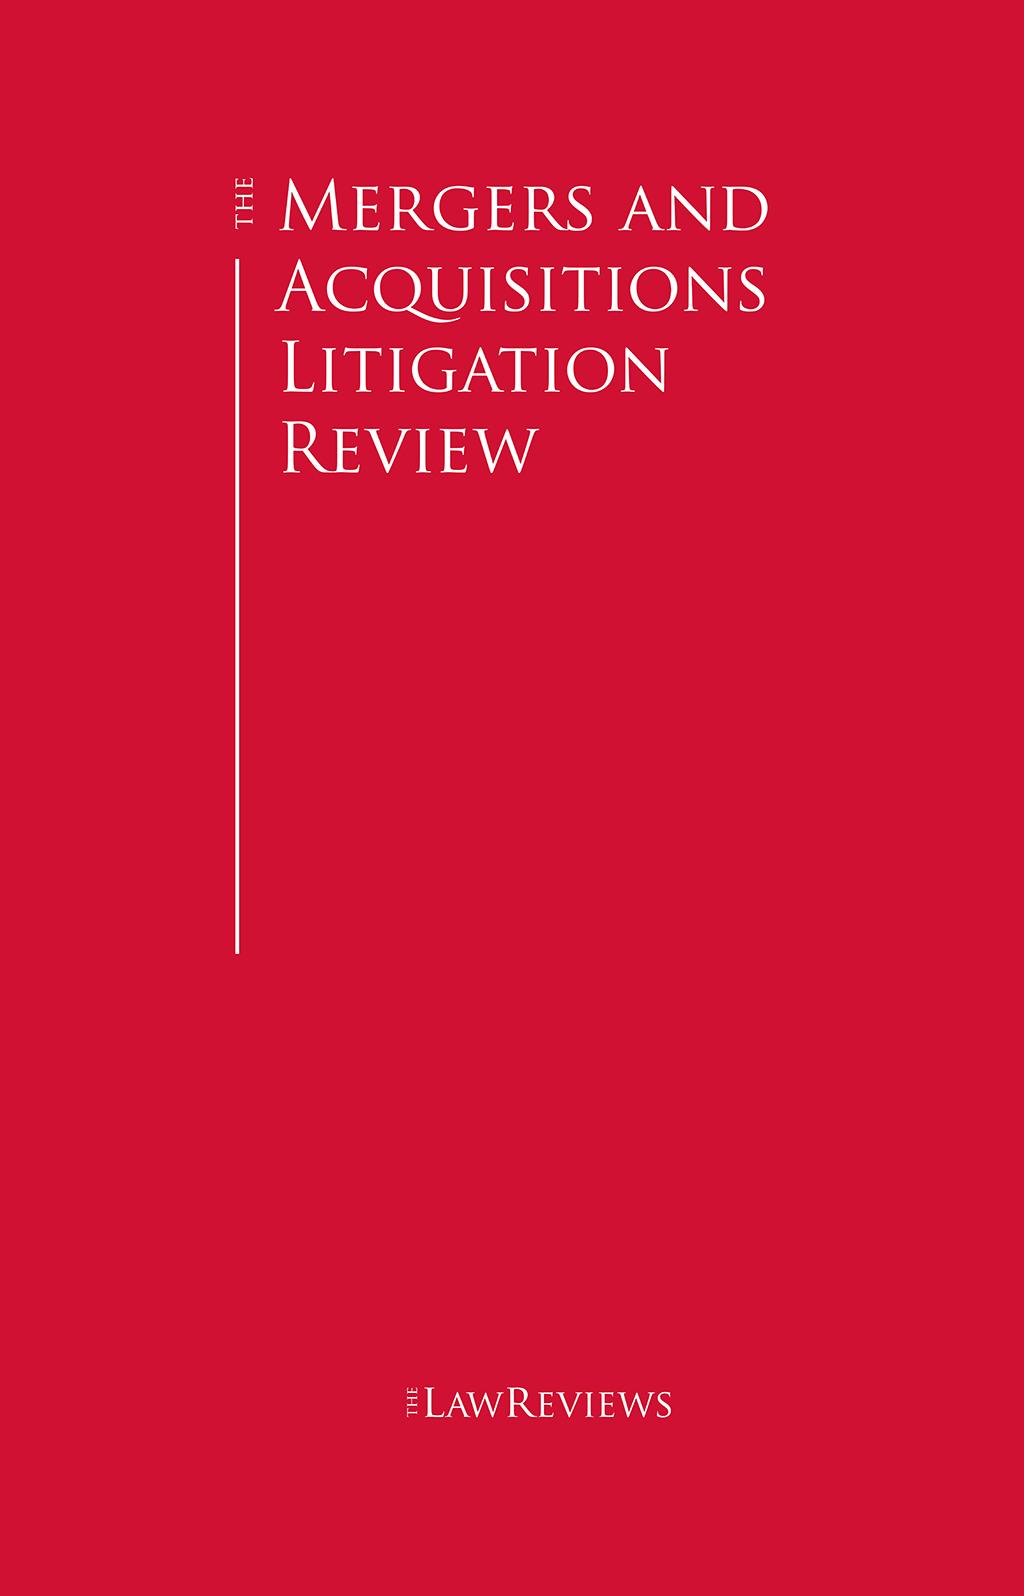 The Mergers & Acquisitions Litigation Review